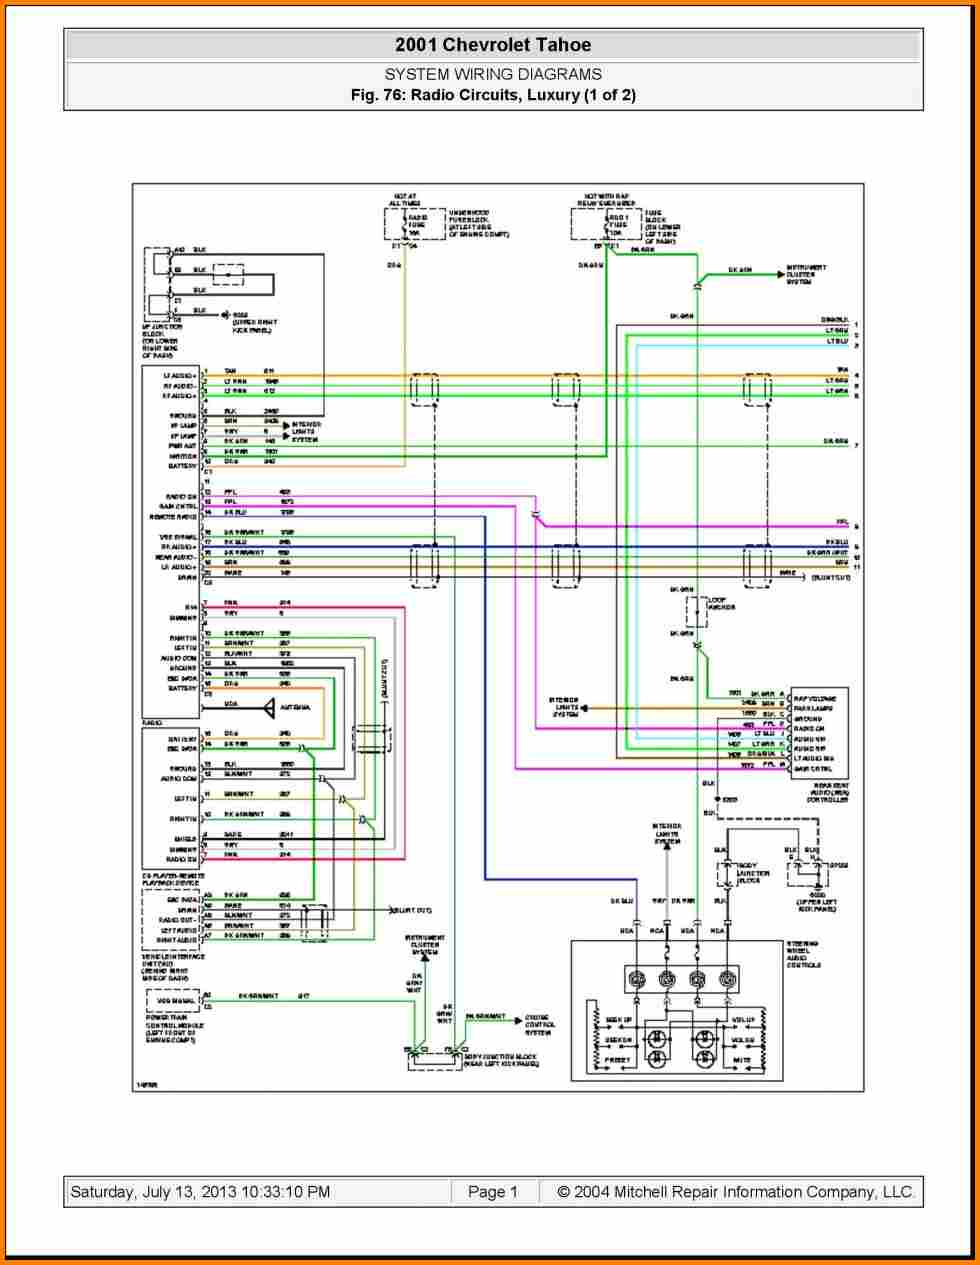 Trailer Light Wiring Diagram Chevy Silverado Tail Light Diagram Preview Wiring Diagram